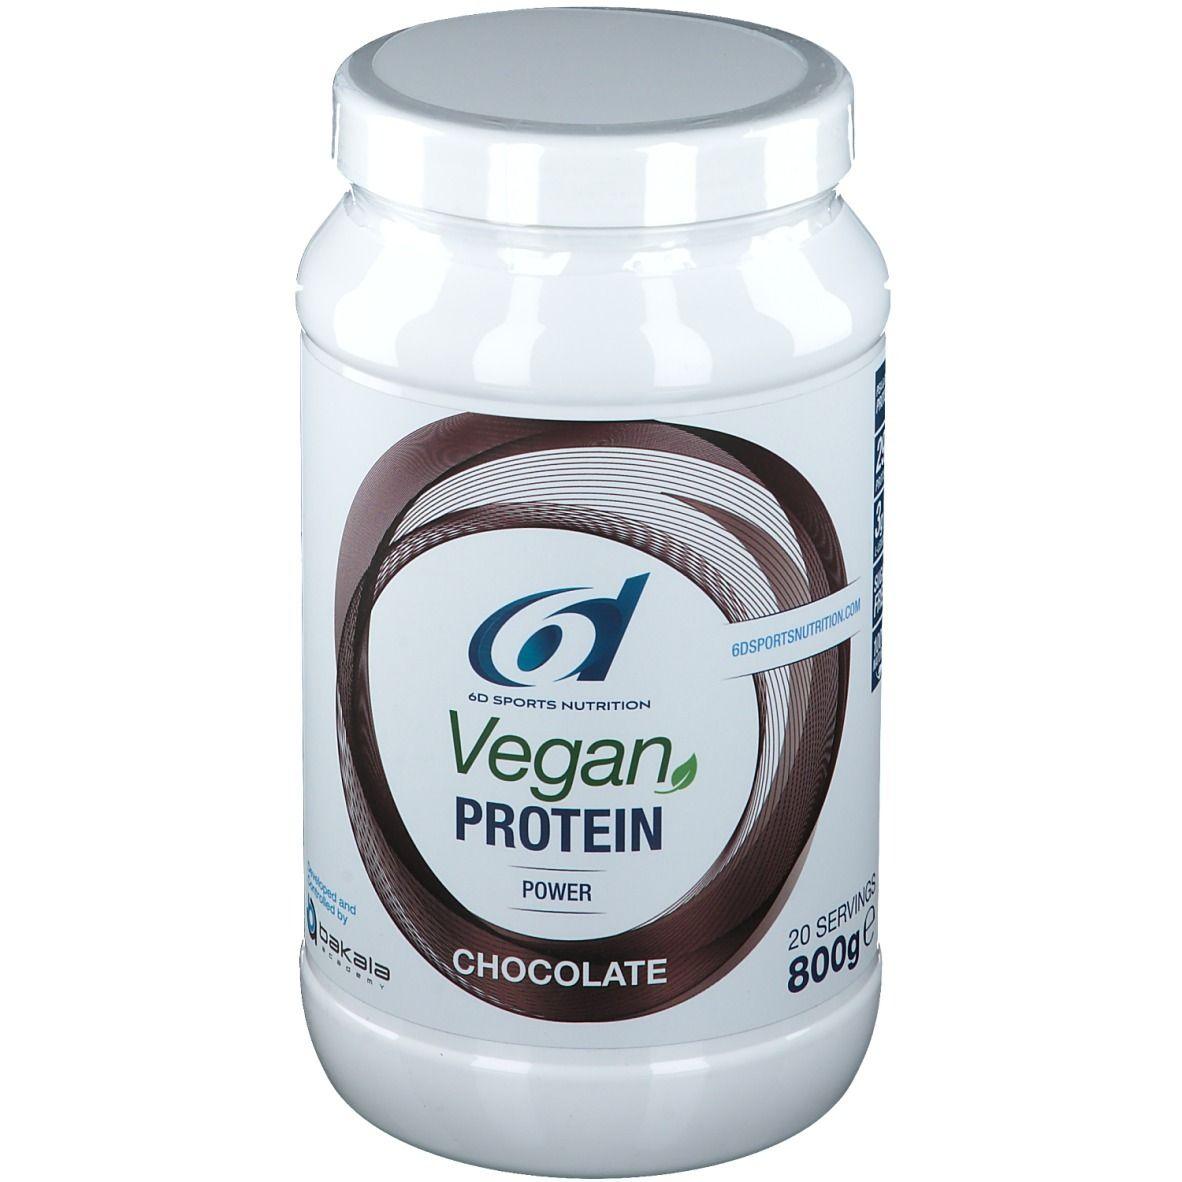 6D SPORTS NUTRITION Vegan PROTEIN Chocolat g poudre